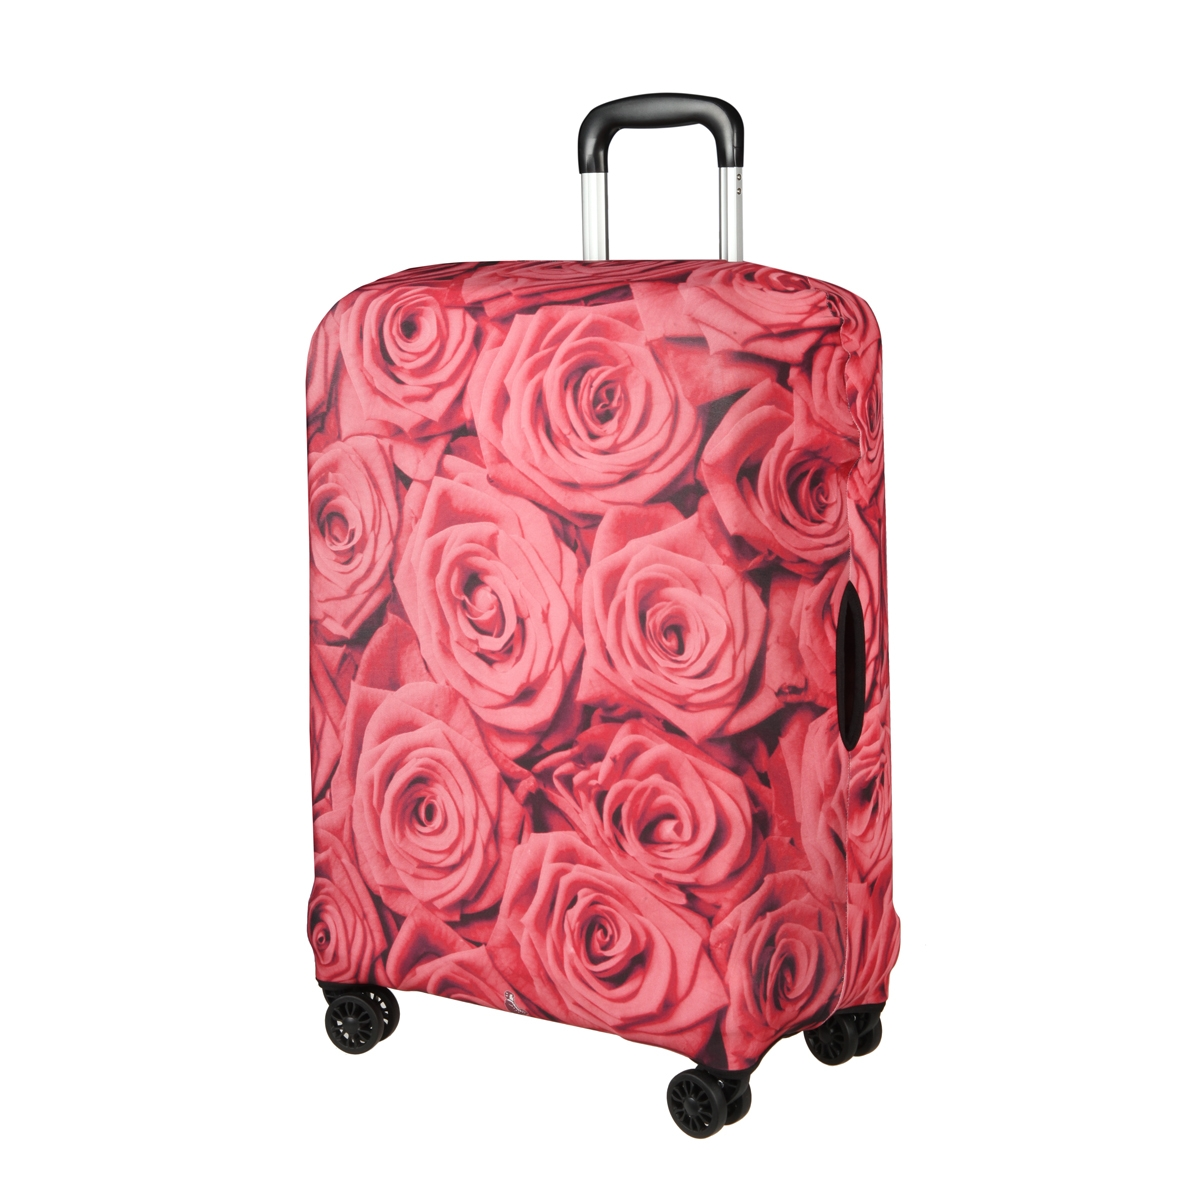 Защитное покрытие для чемодана Gianni Conti 9042 M.